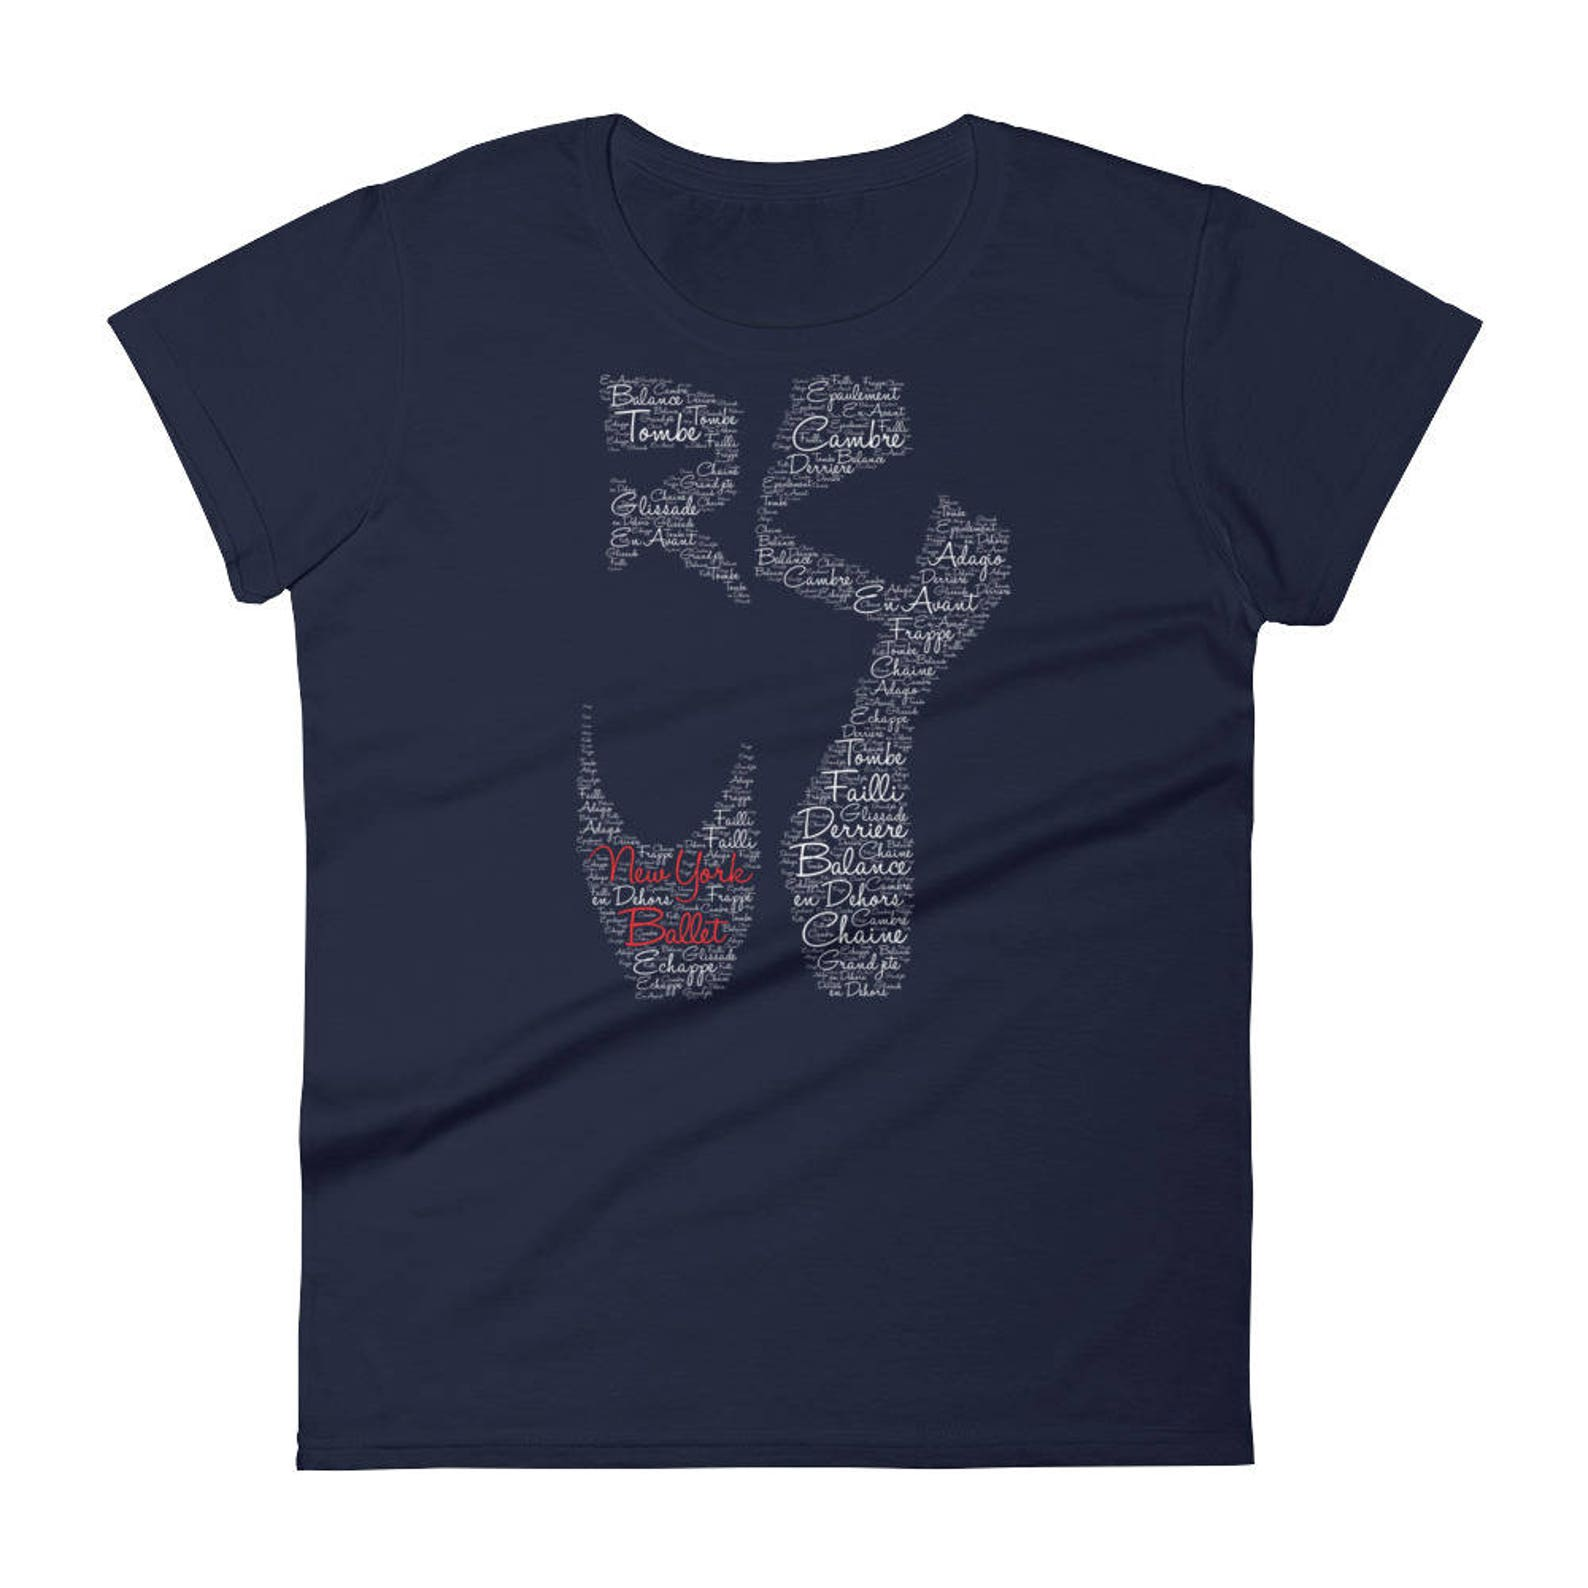 new york ballet pointe shoe - t-shirt women girls